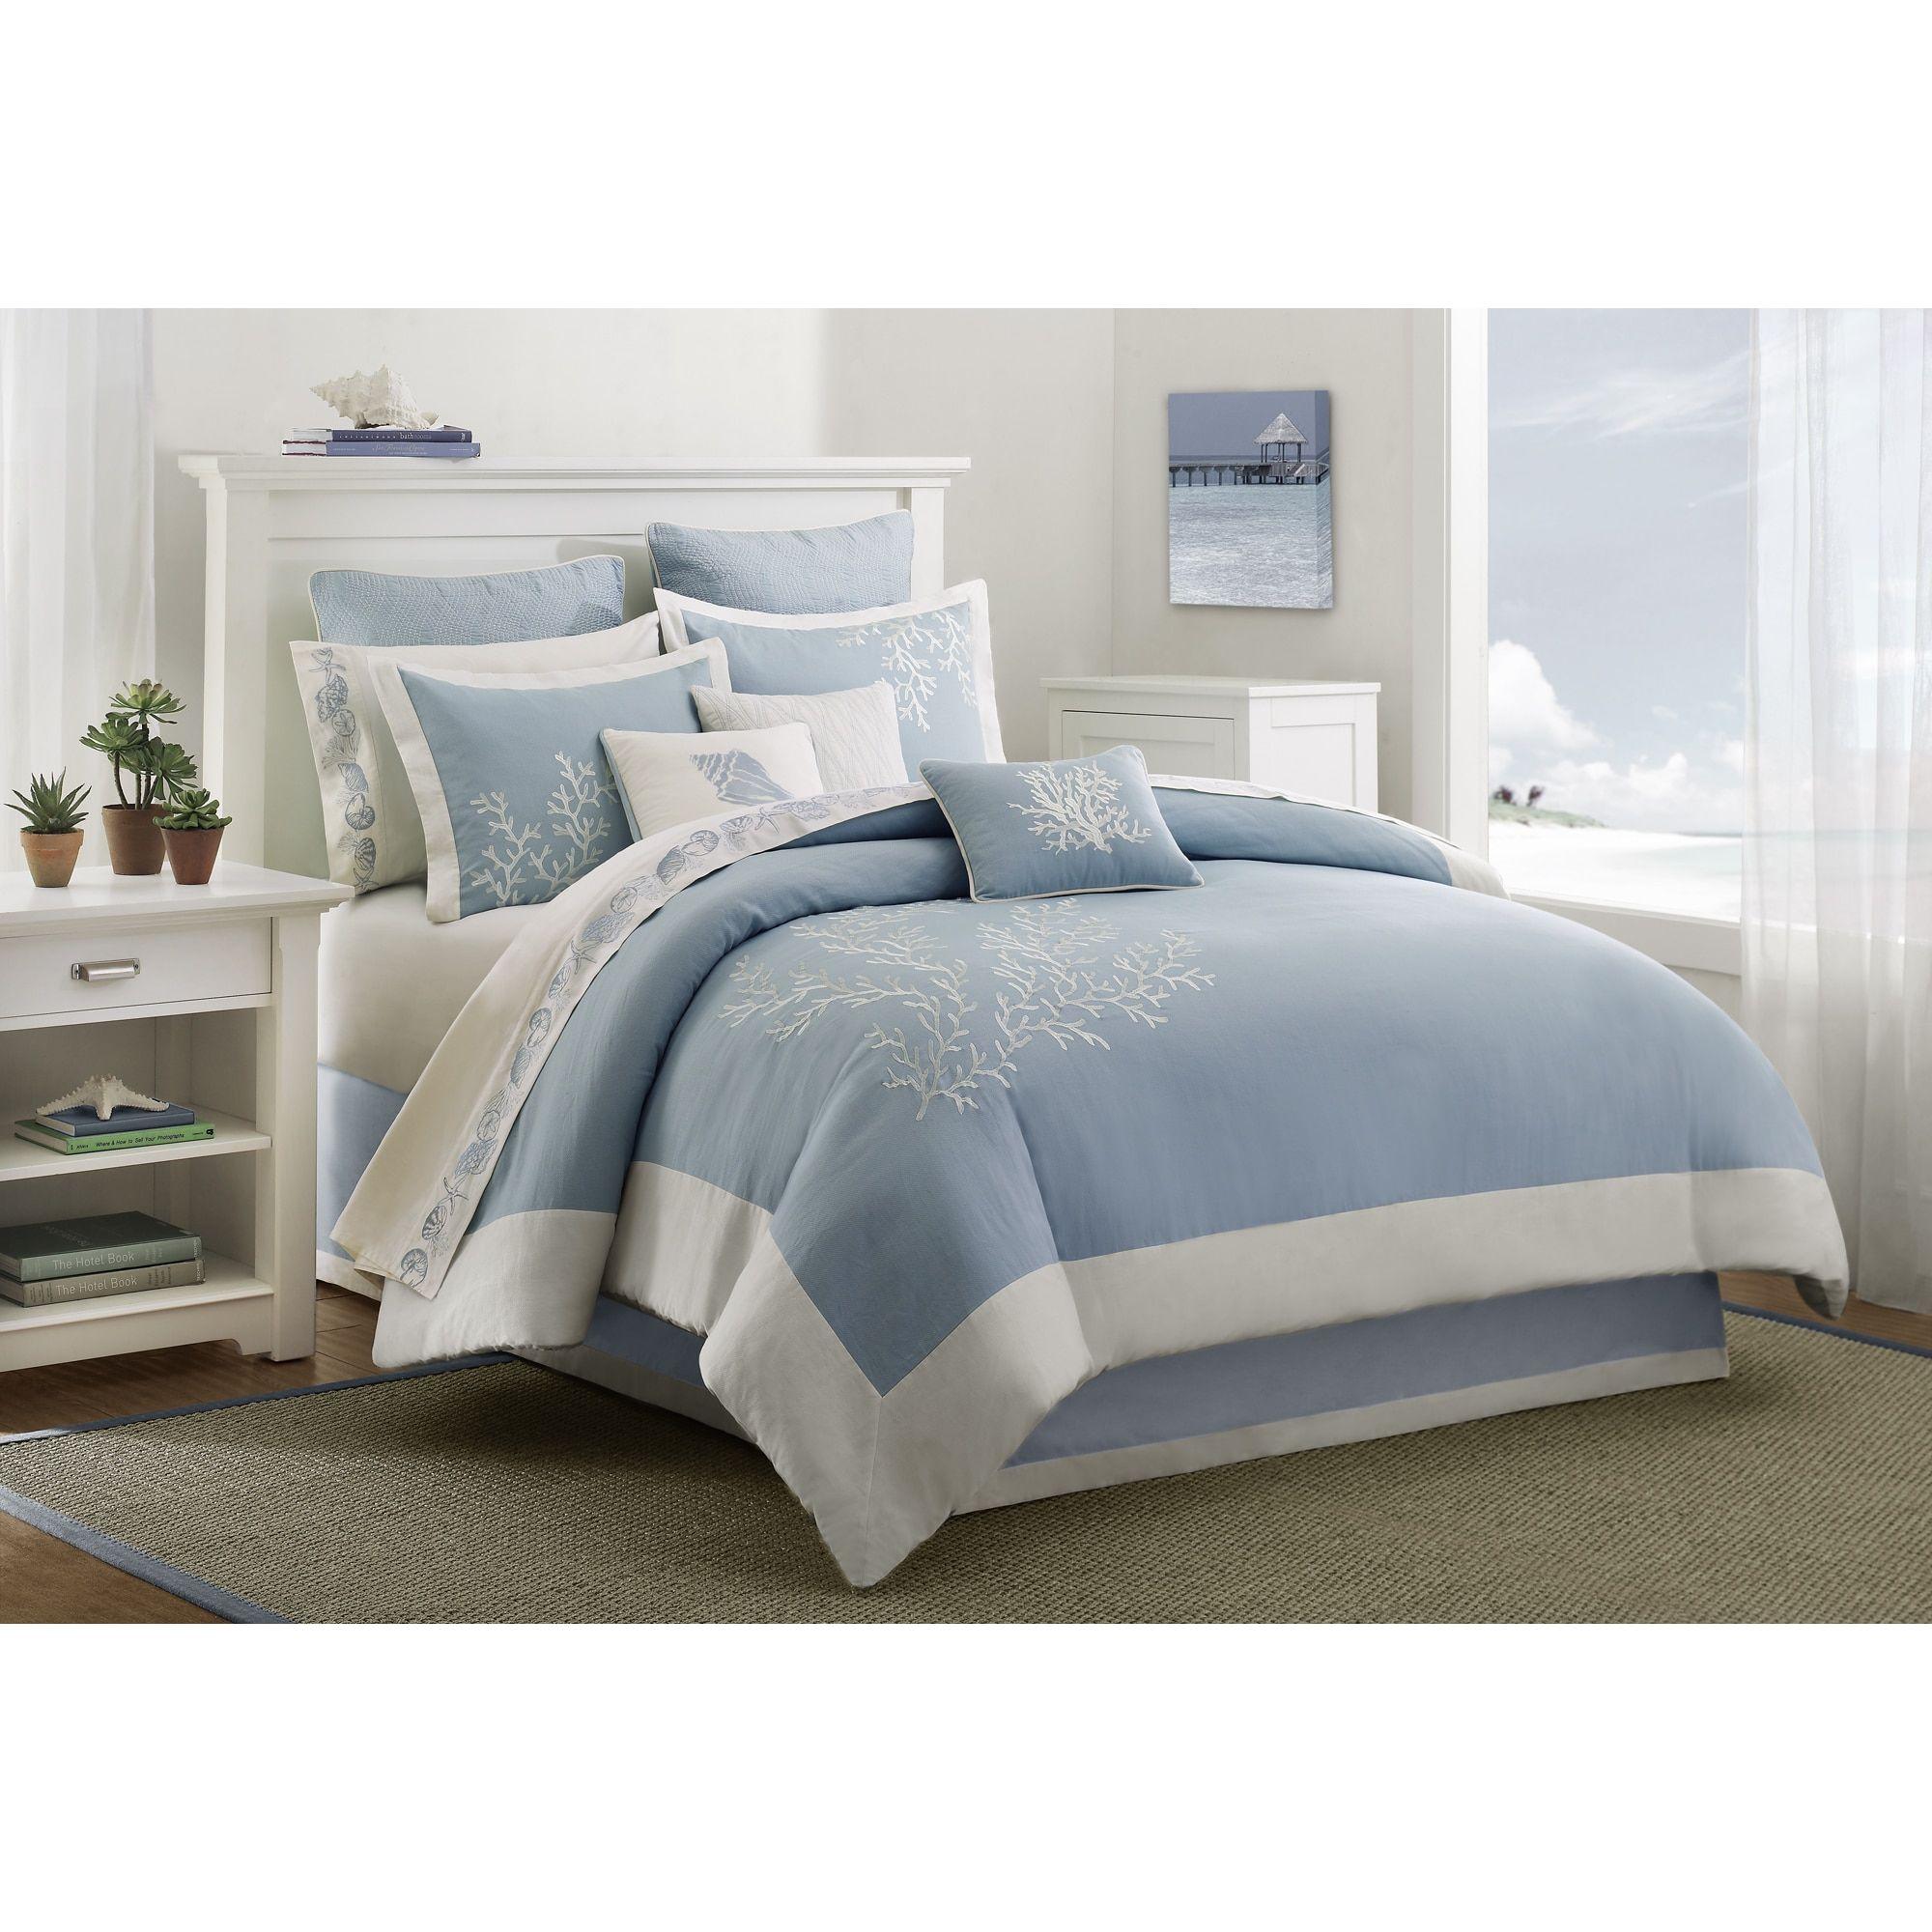 Harbor House Coastline Aqua (Blue) Cotton 3 Piece Duvet Cover Set